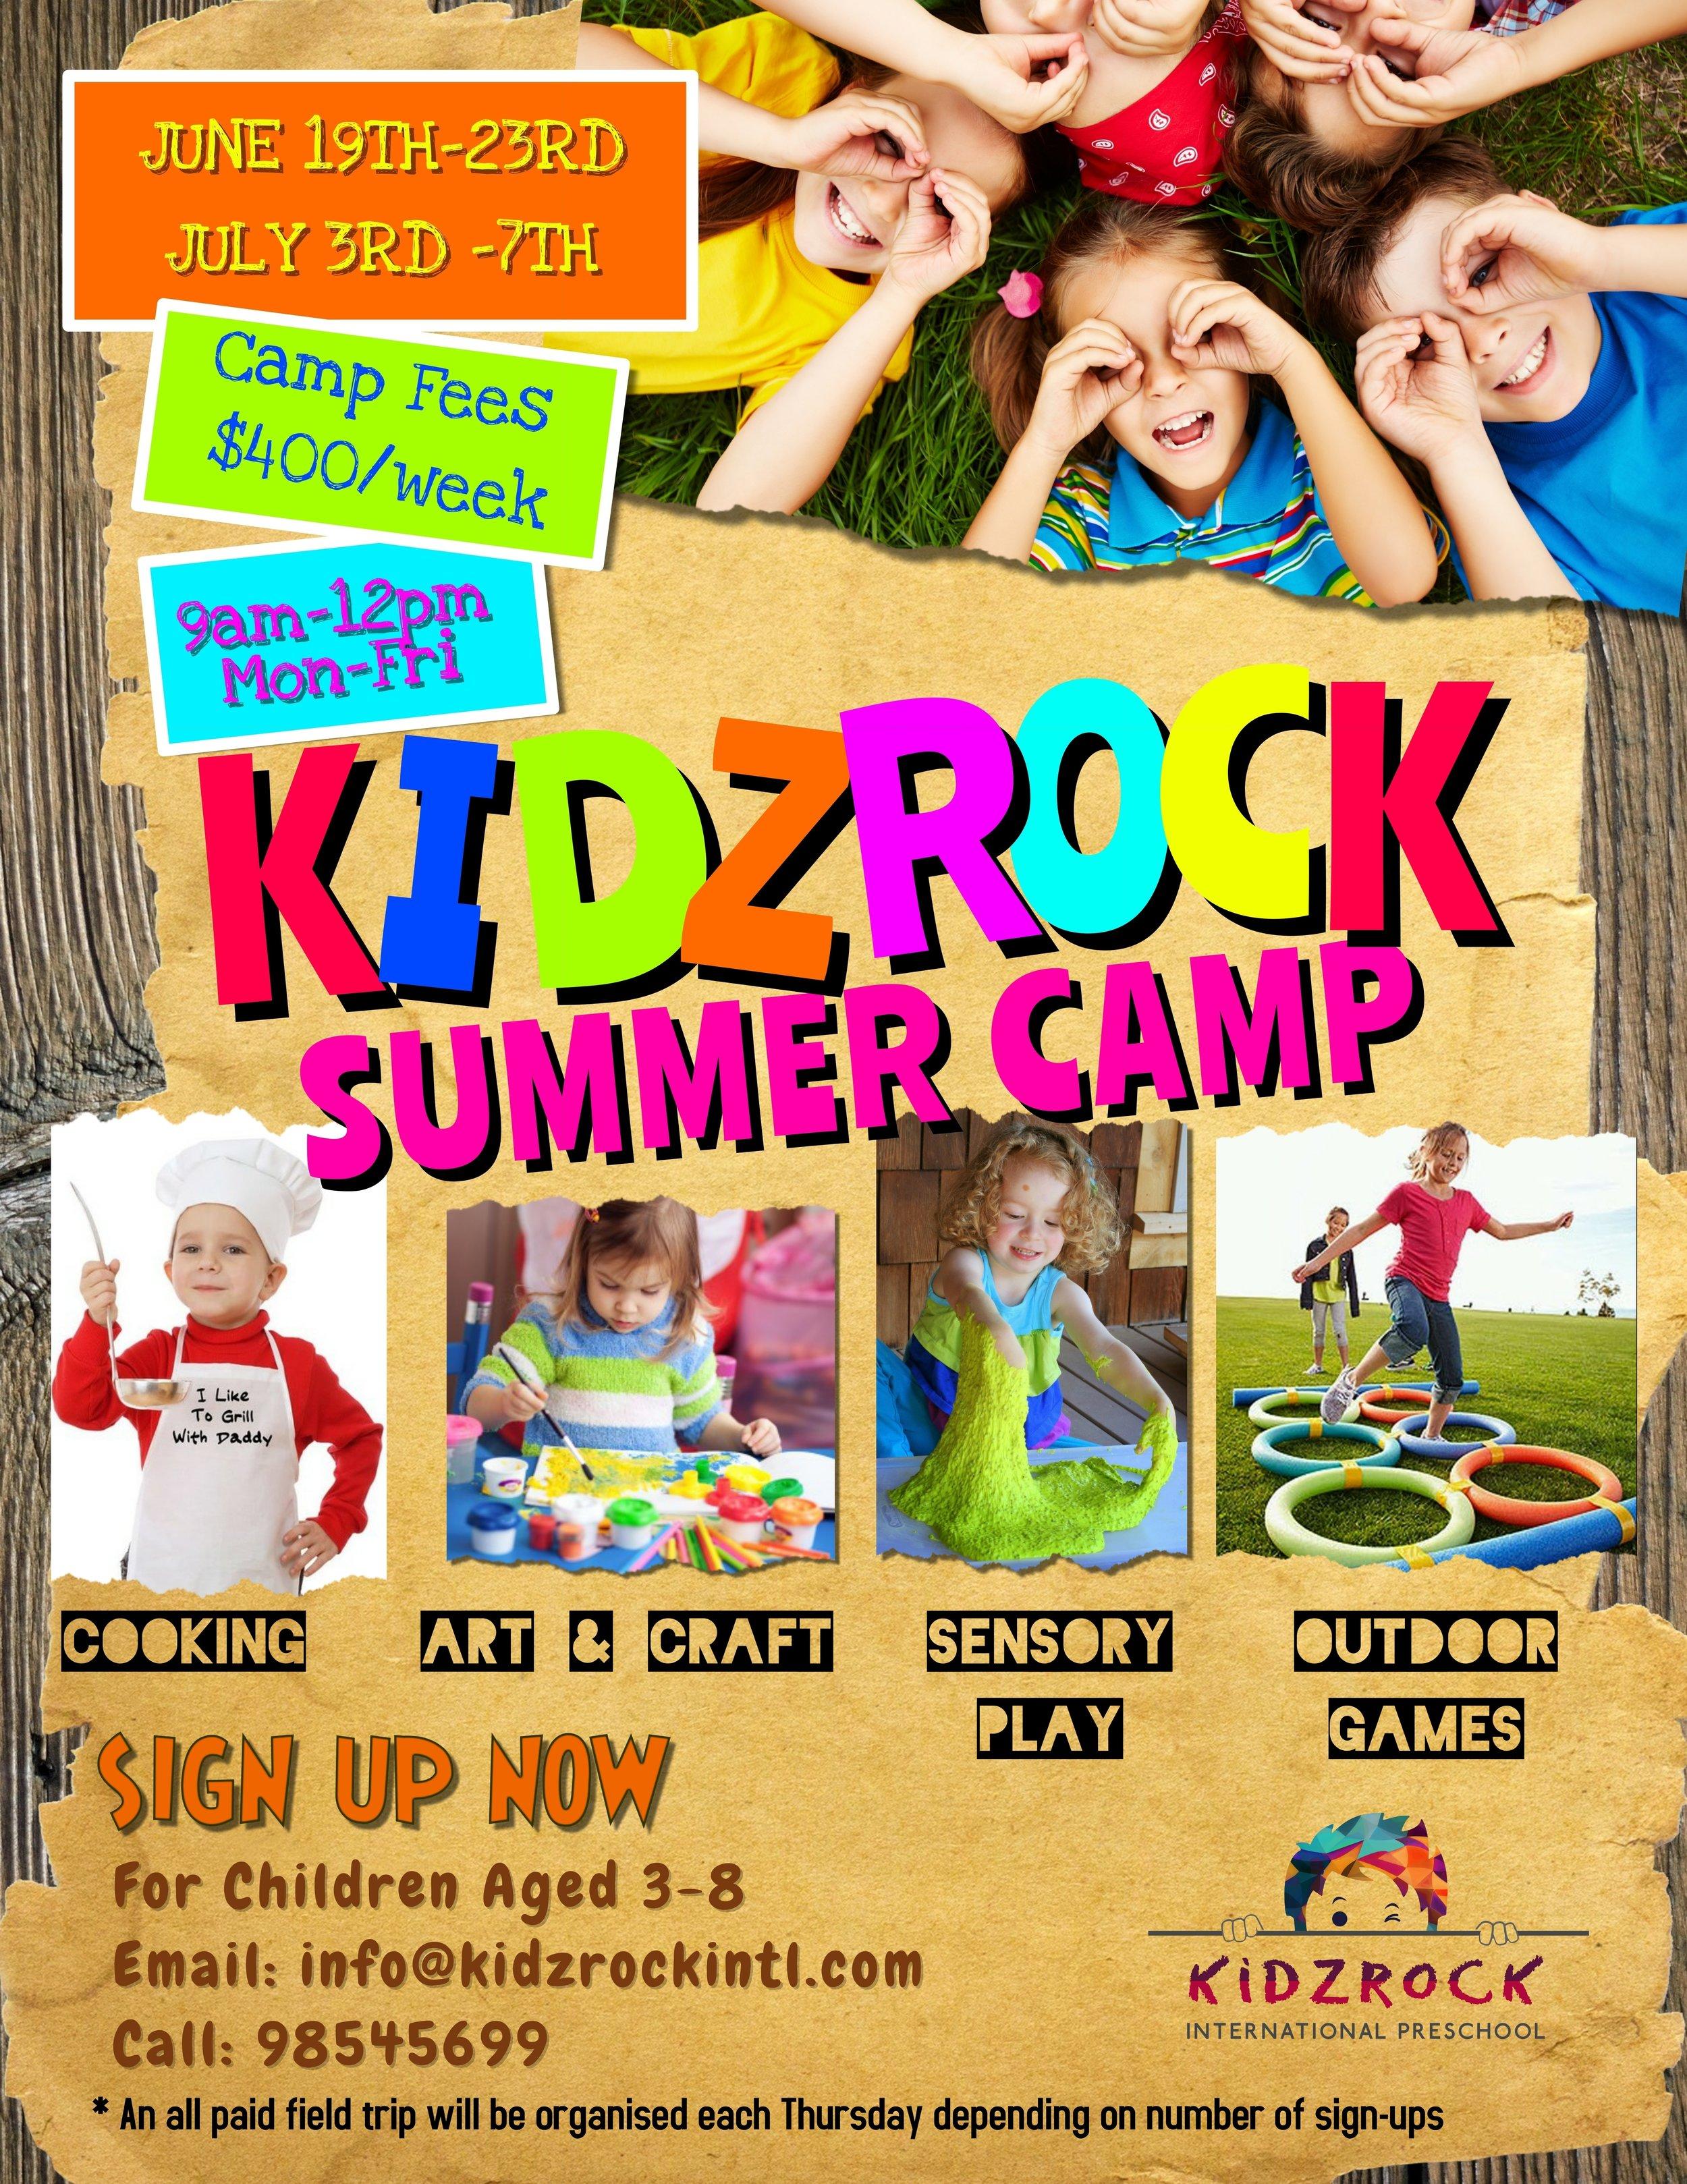 KidzRock Summer Camp.jpg